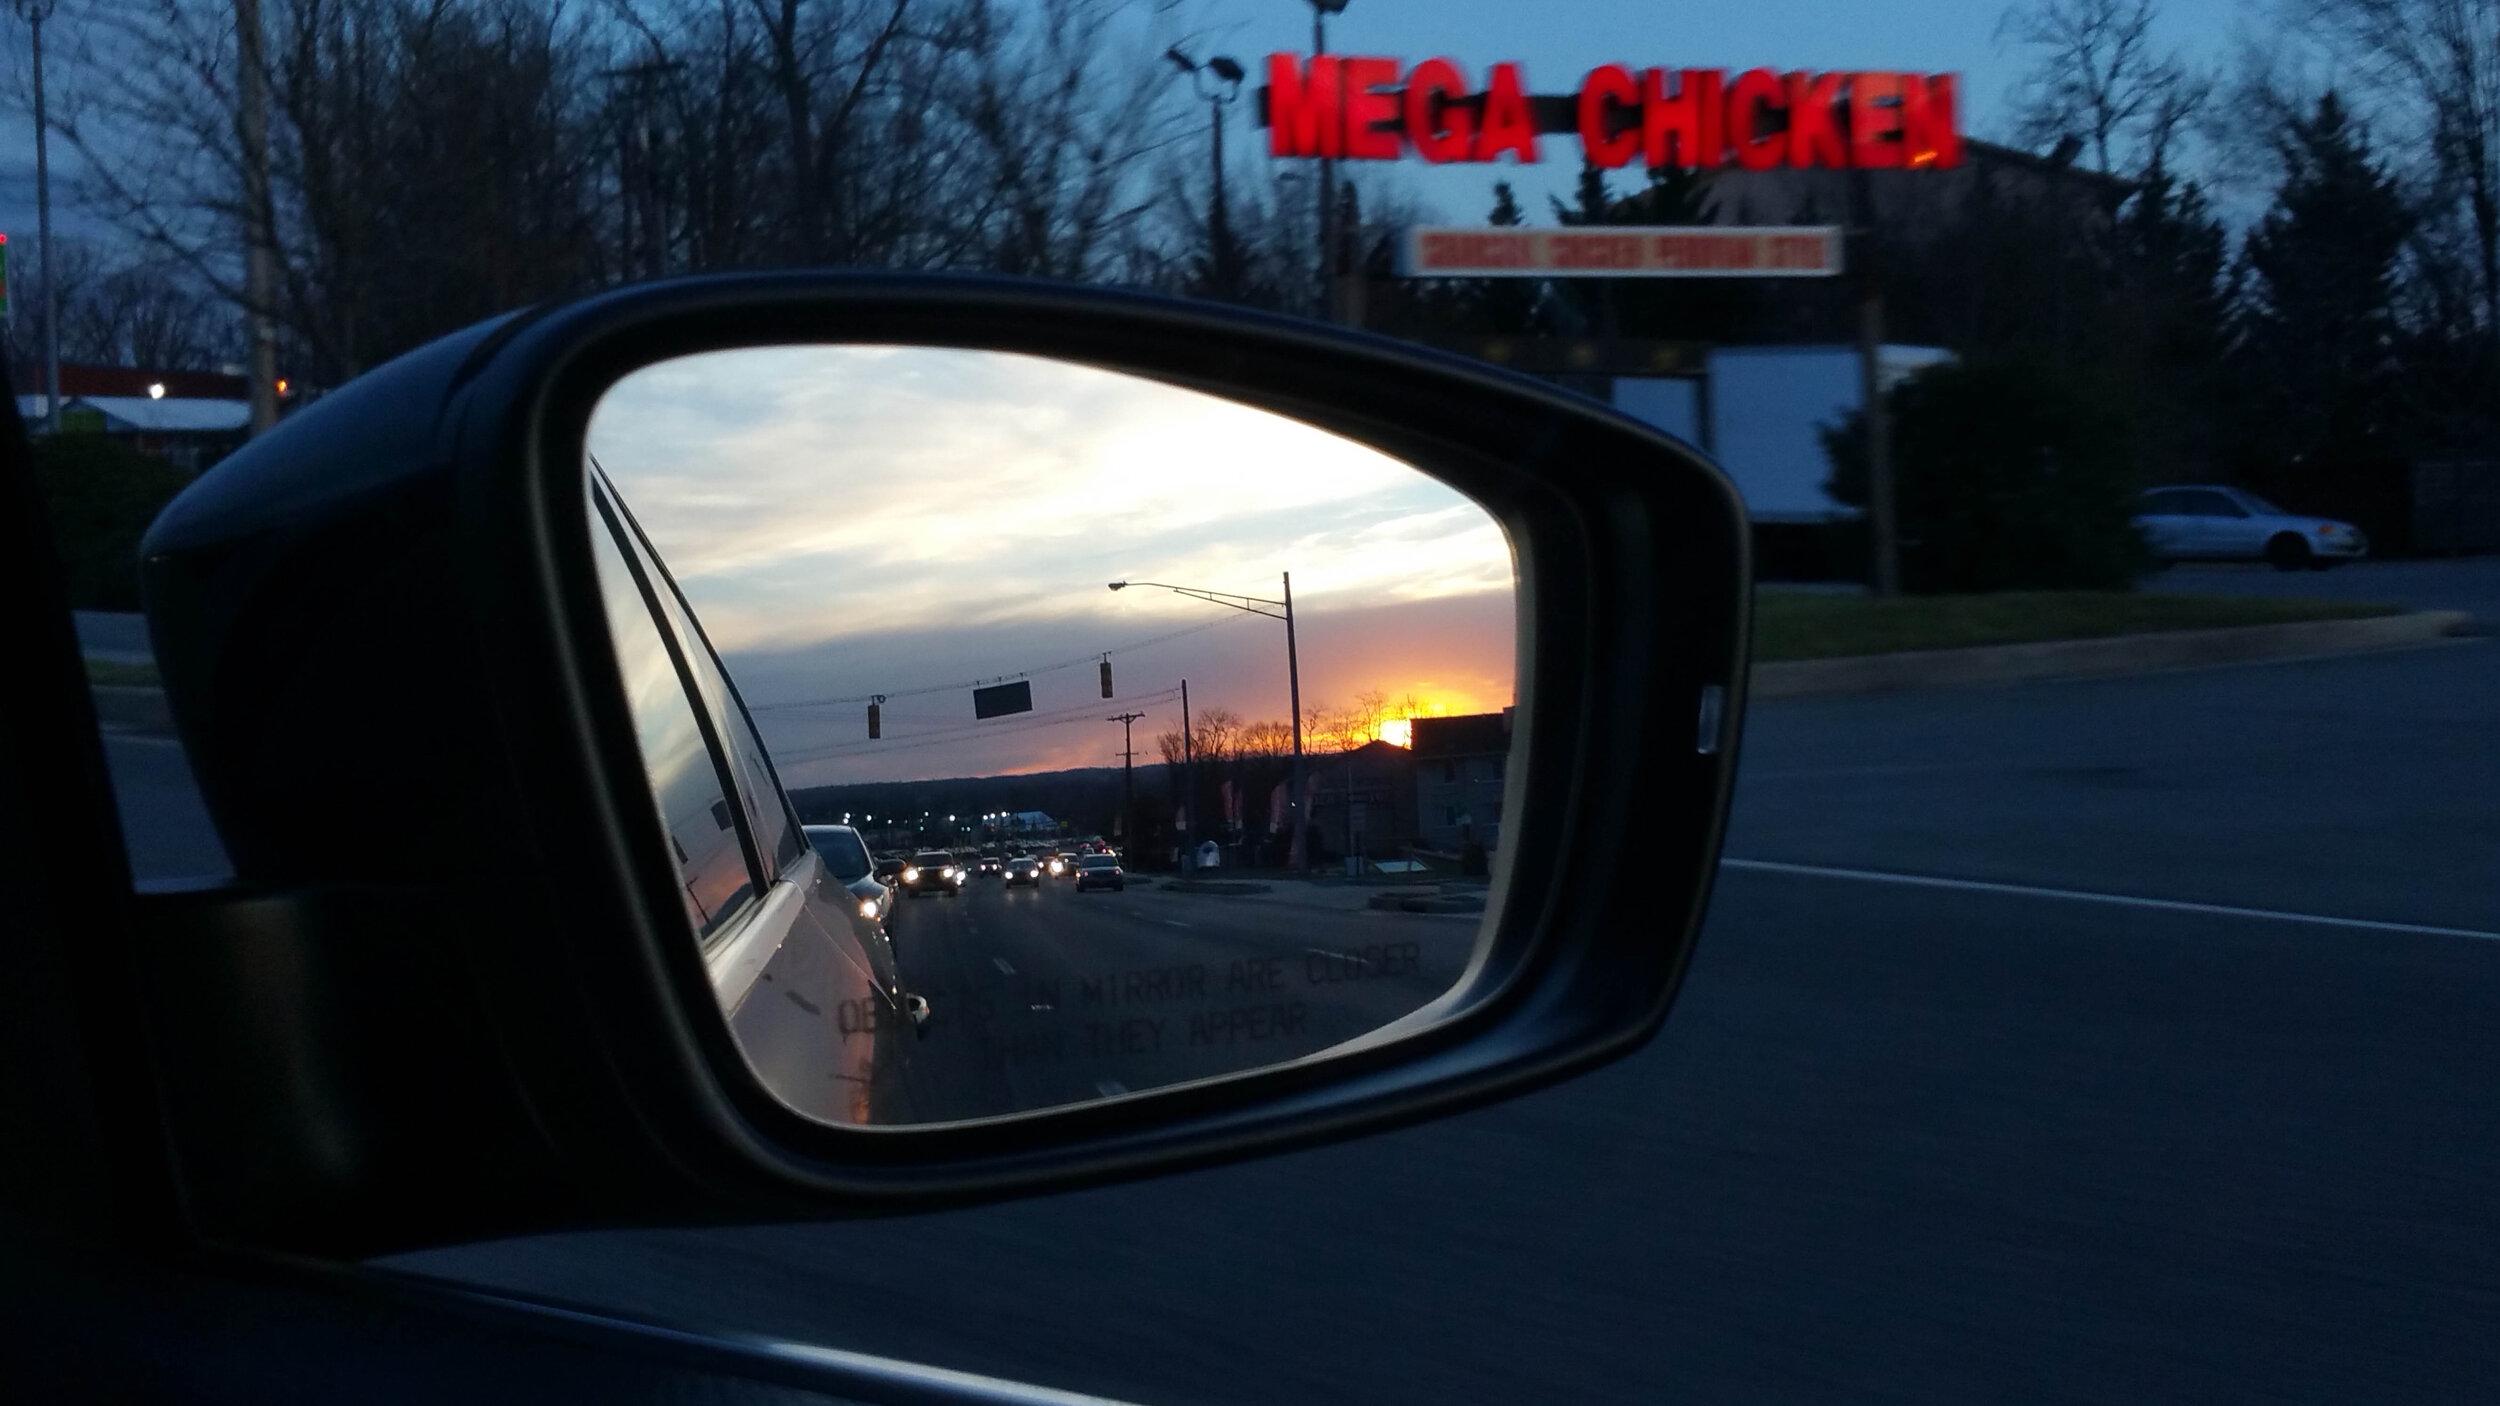 2016-03-07 Sunset in the Mirror--20160307_180151.jpg